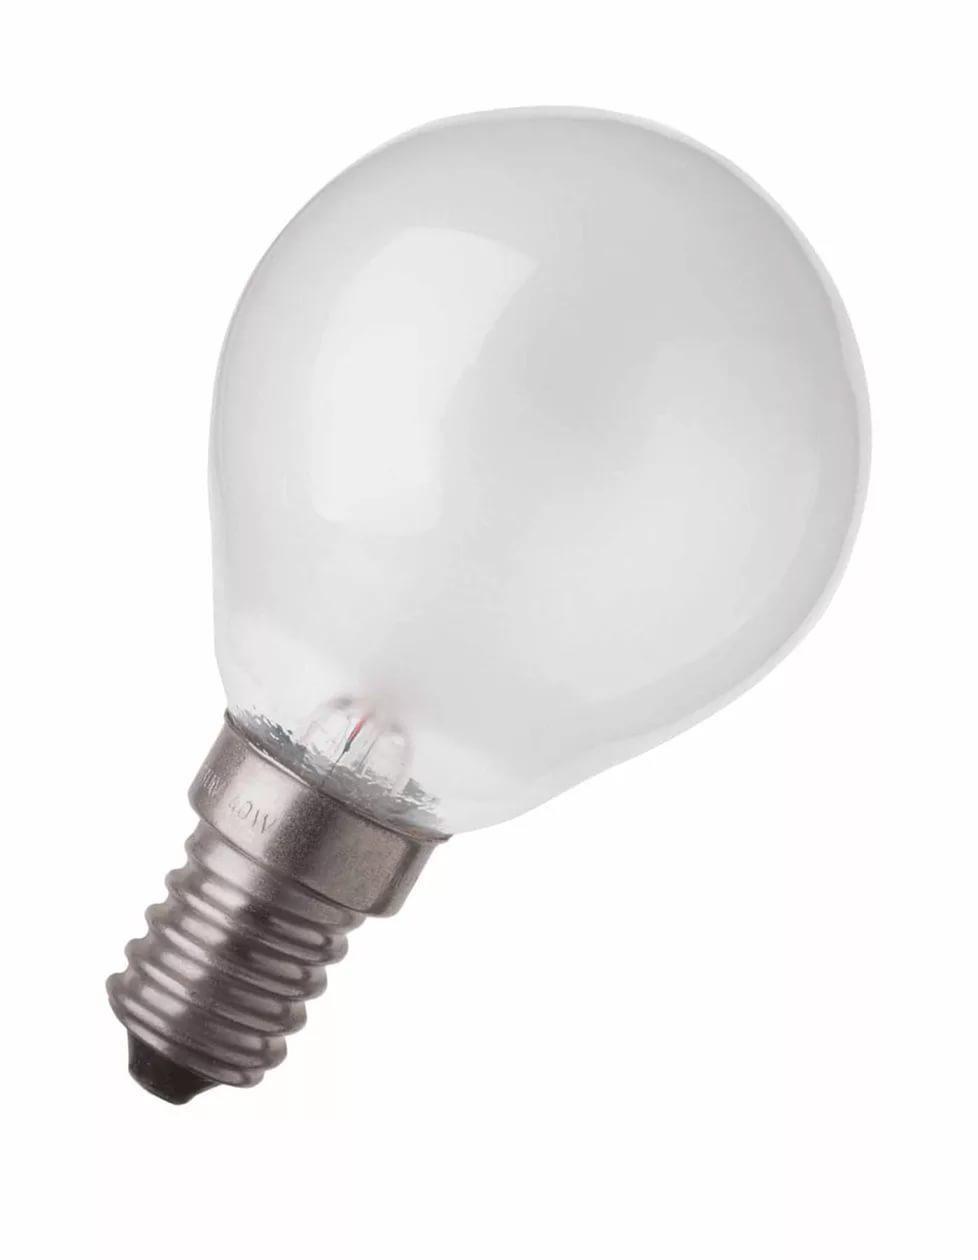 Лампа накаливания Osram Classic p fr 60w e14 лампы osram